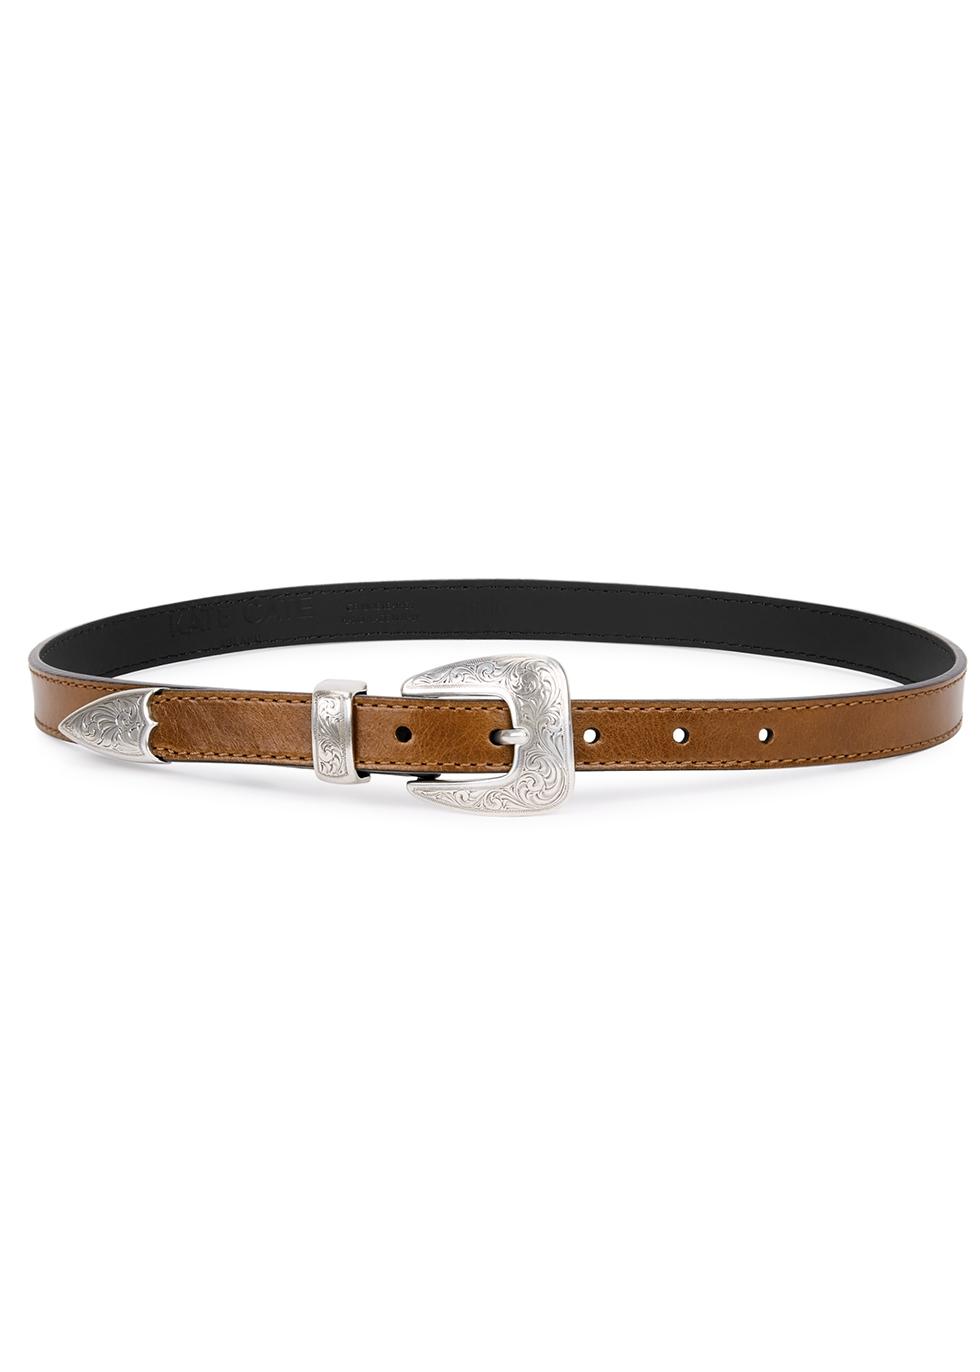 Kim brown leather belt